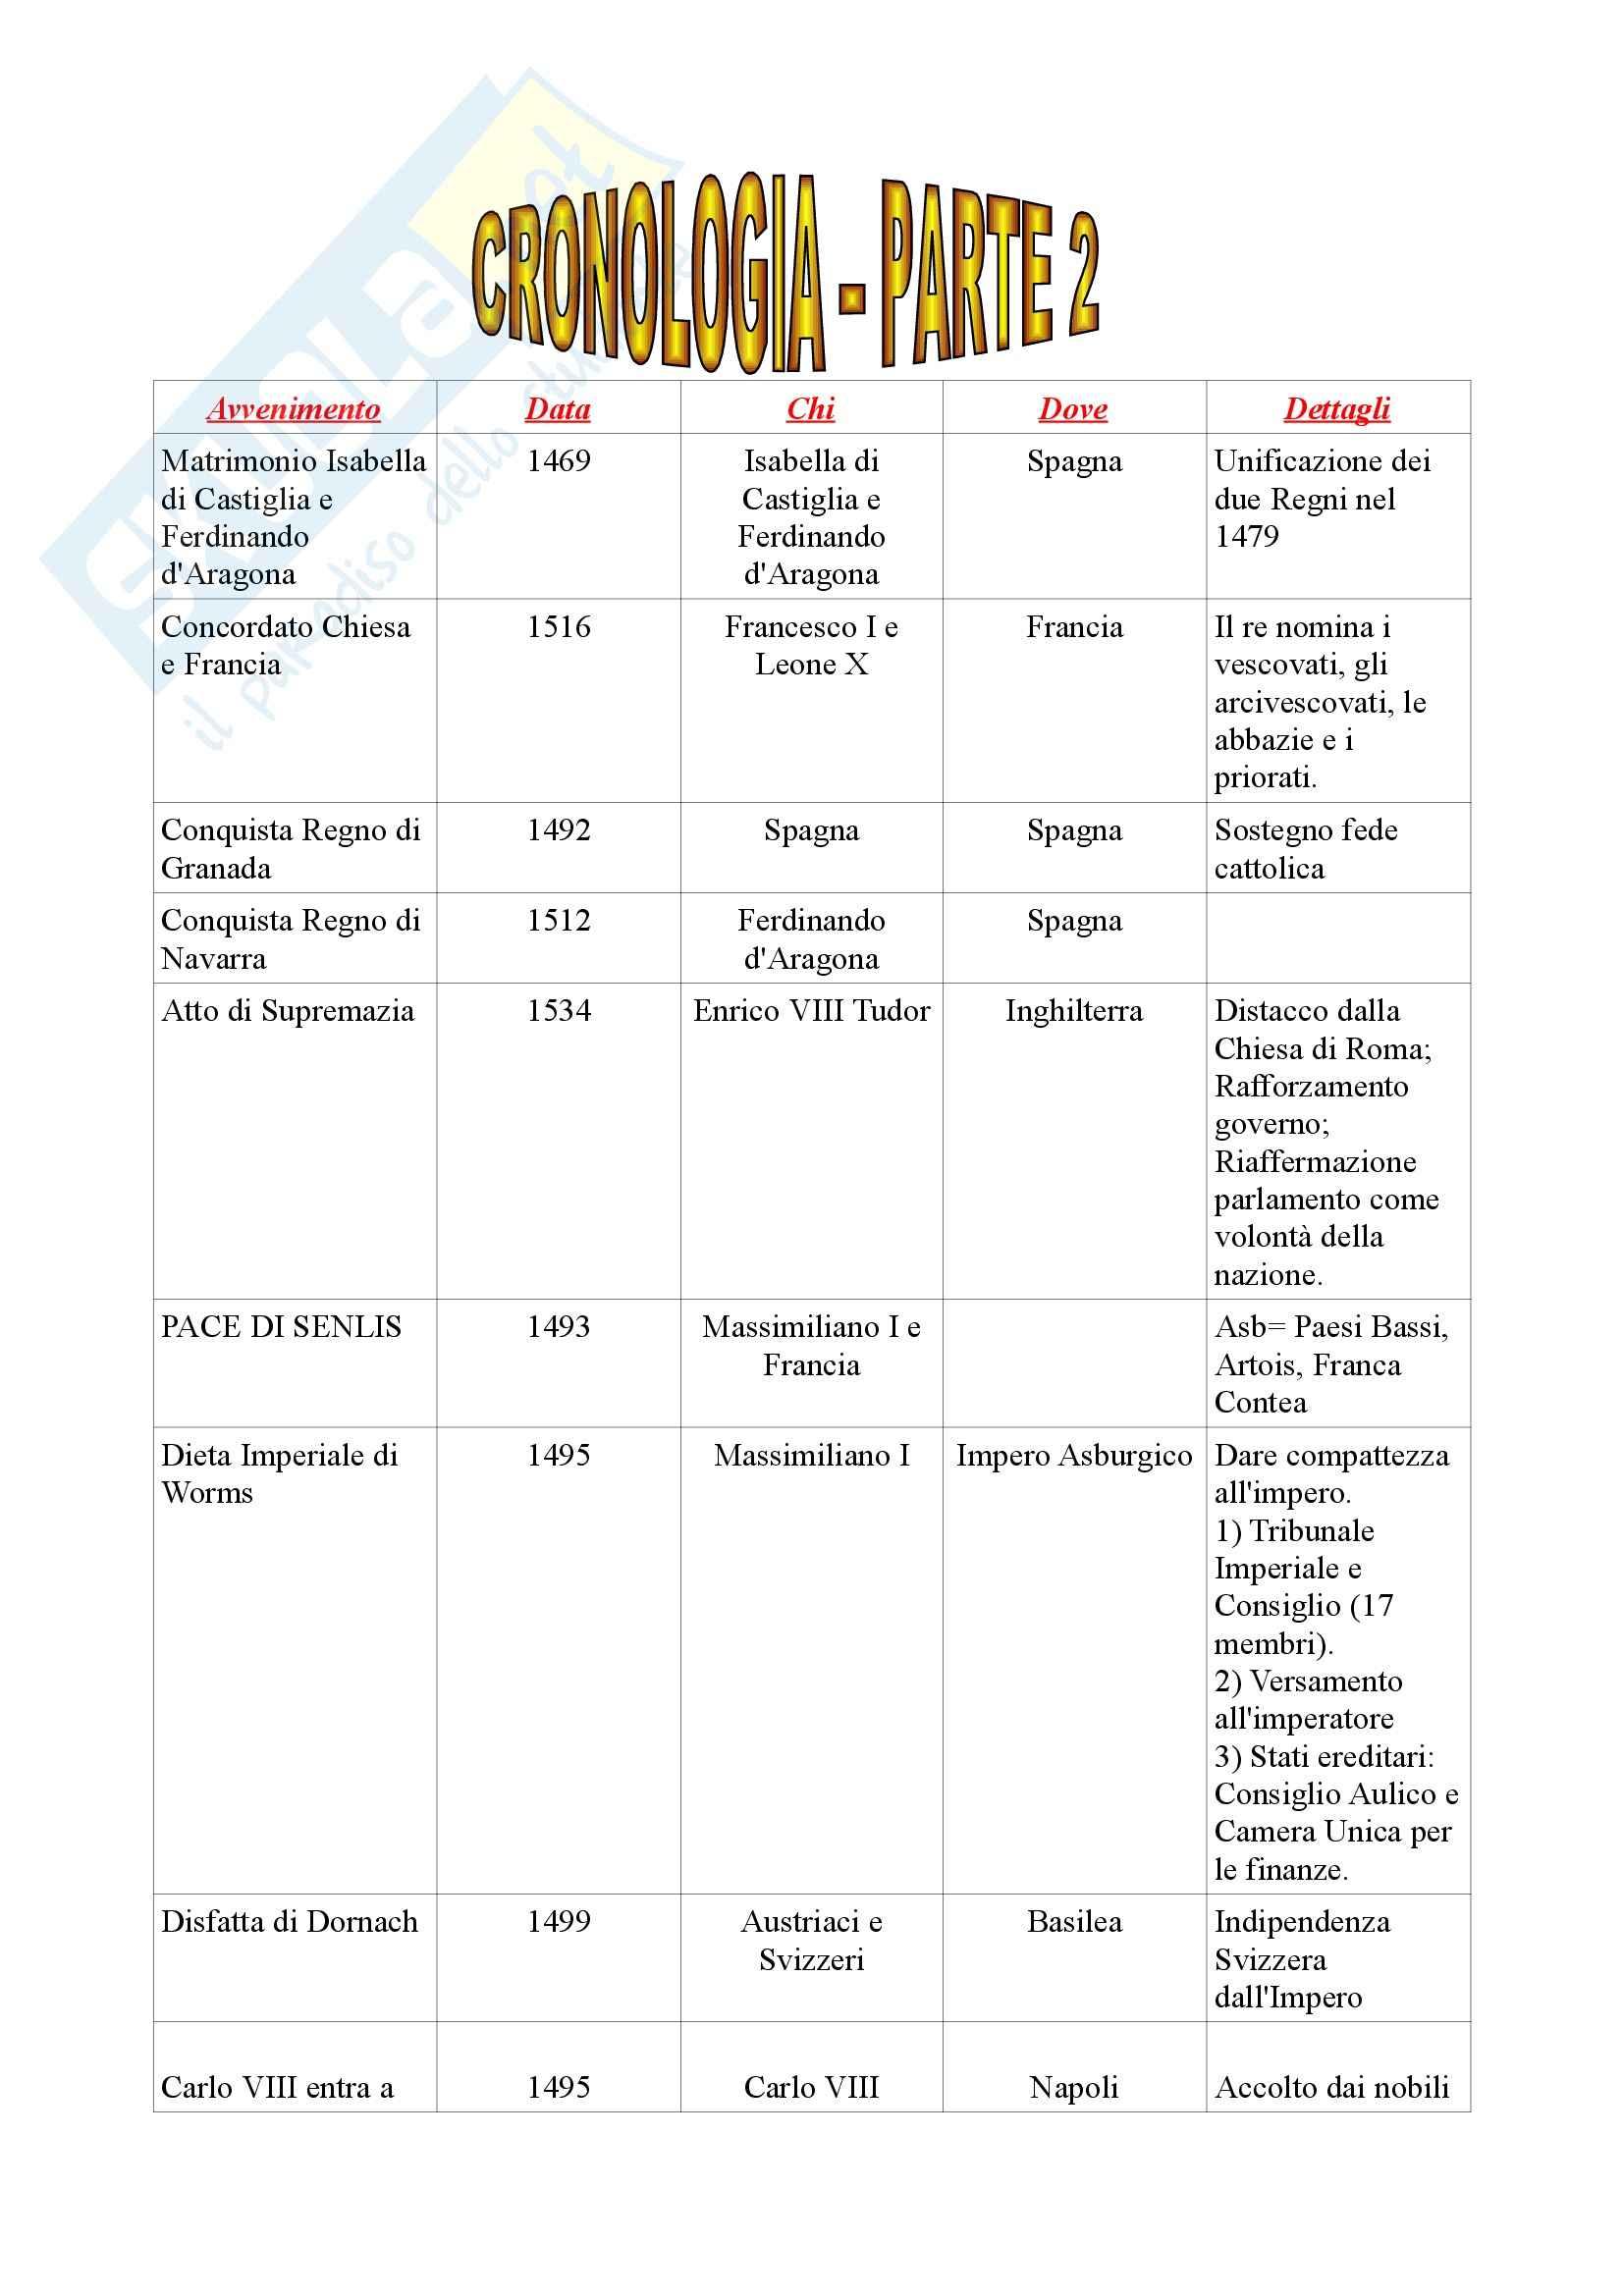 Storia moderna - cronologia della storia moderna